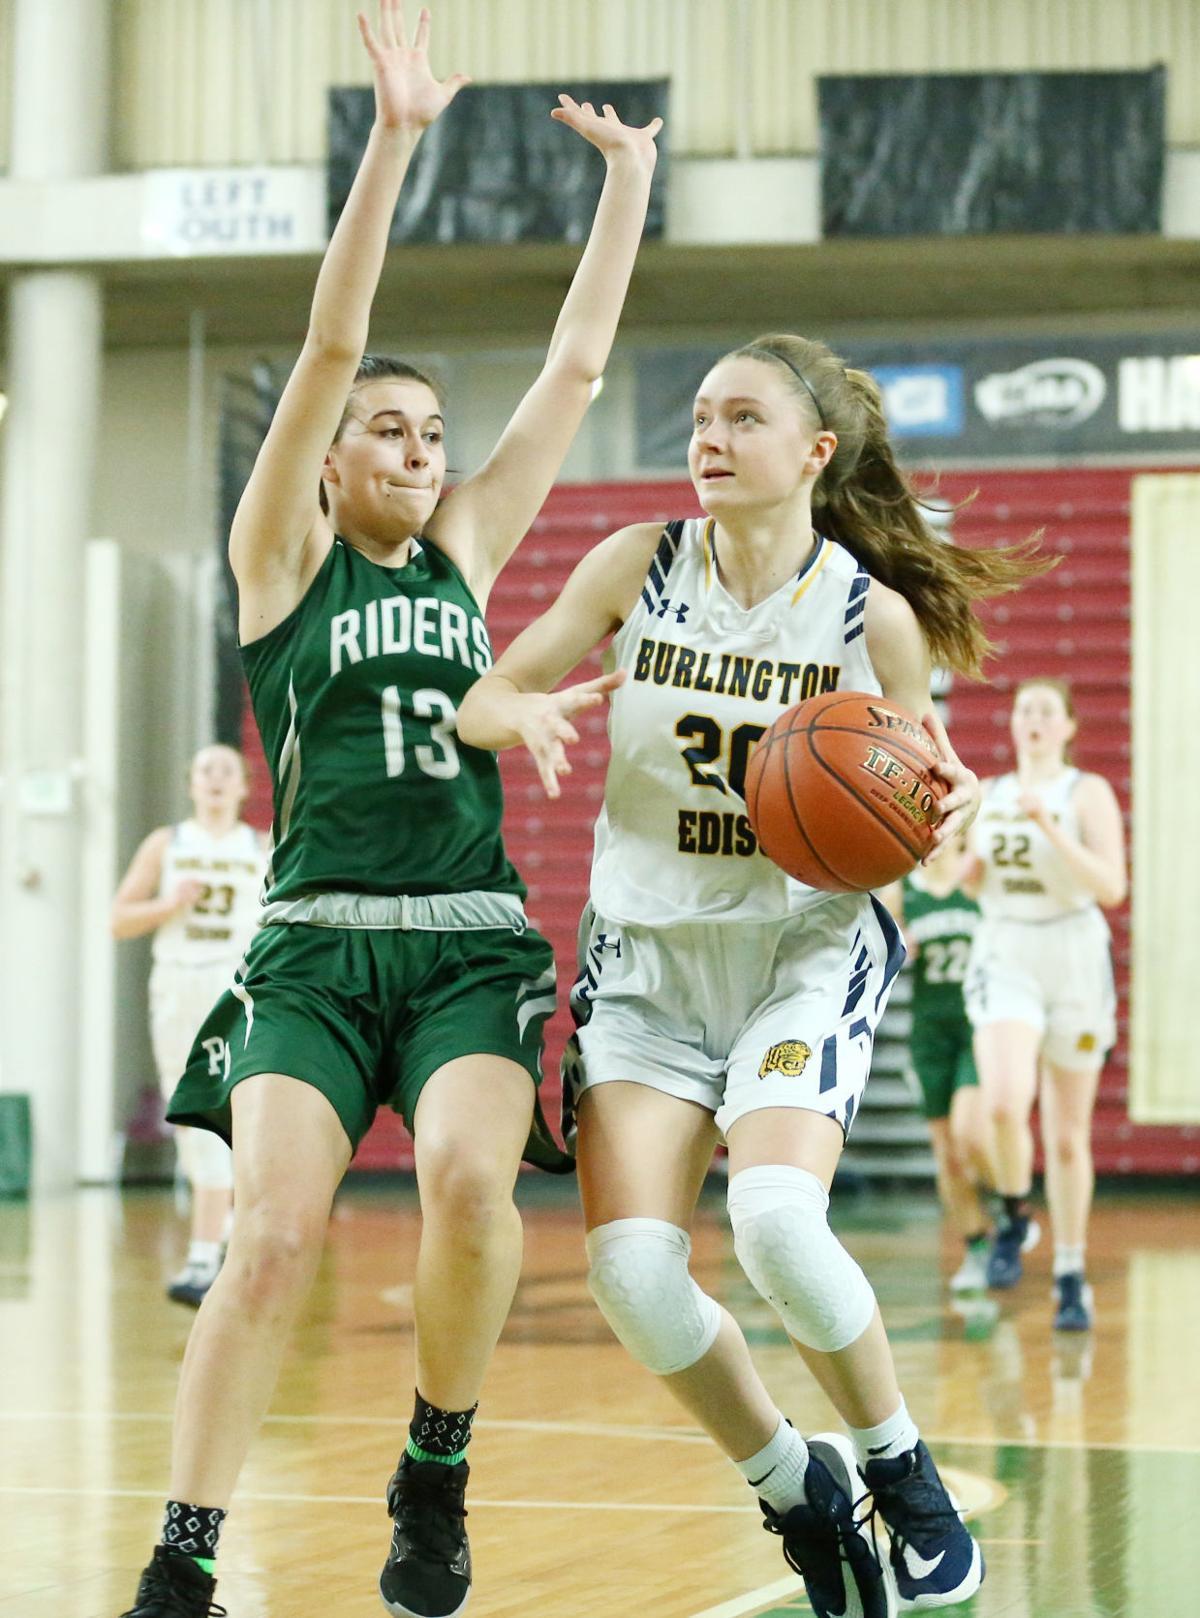 Burlington-Edison Girls' Basketball